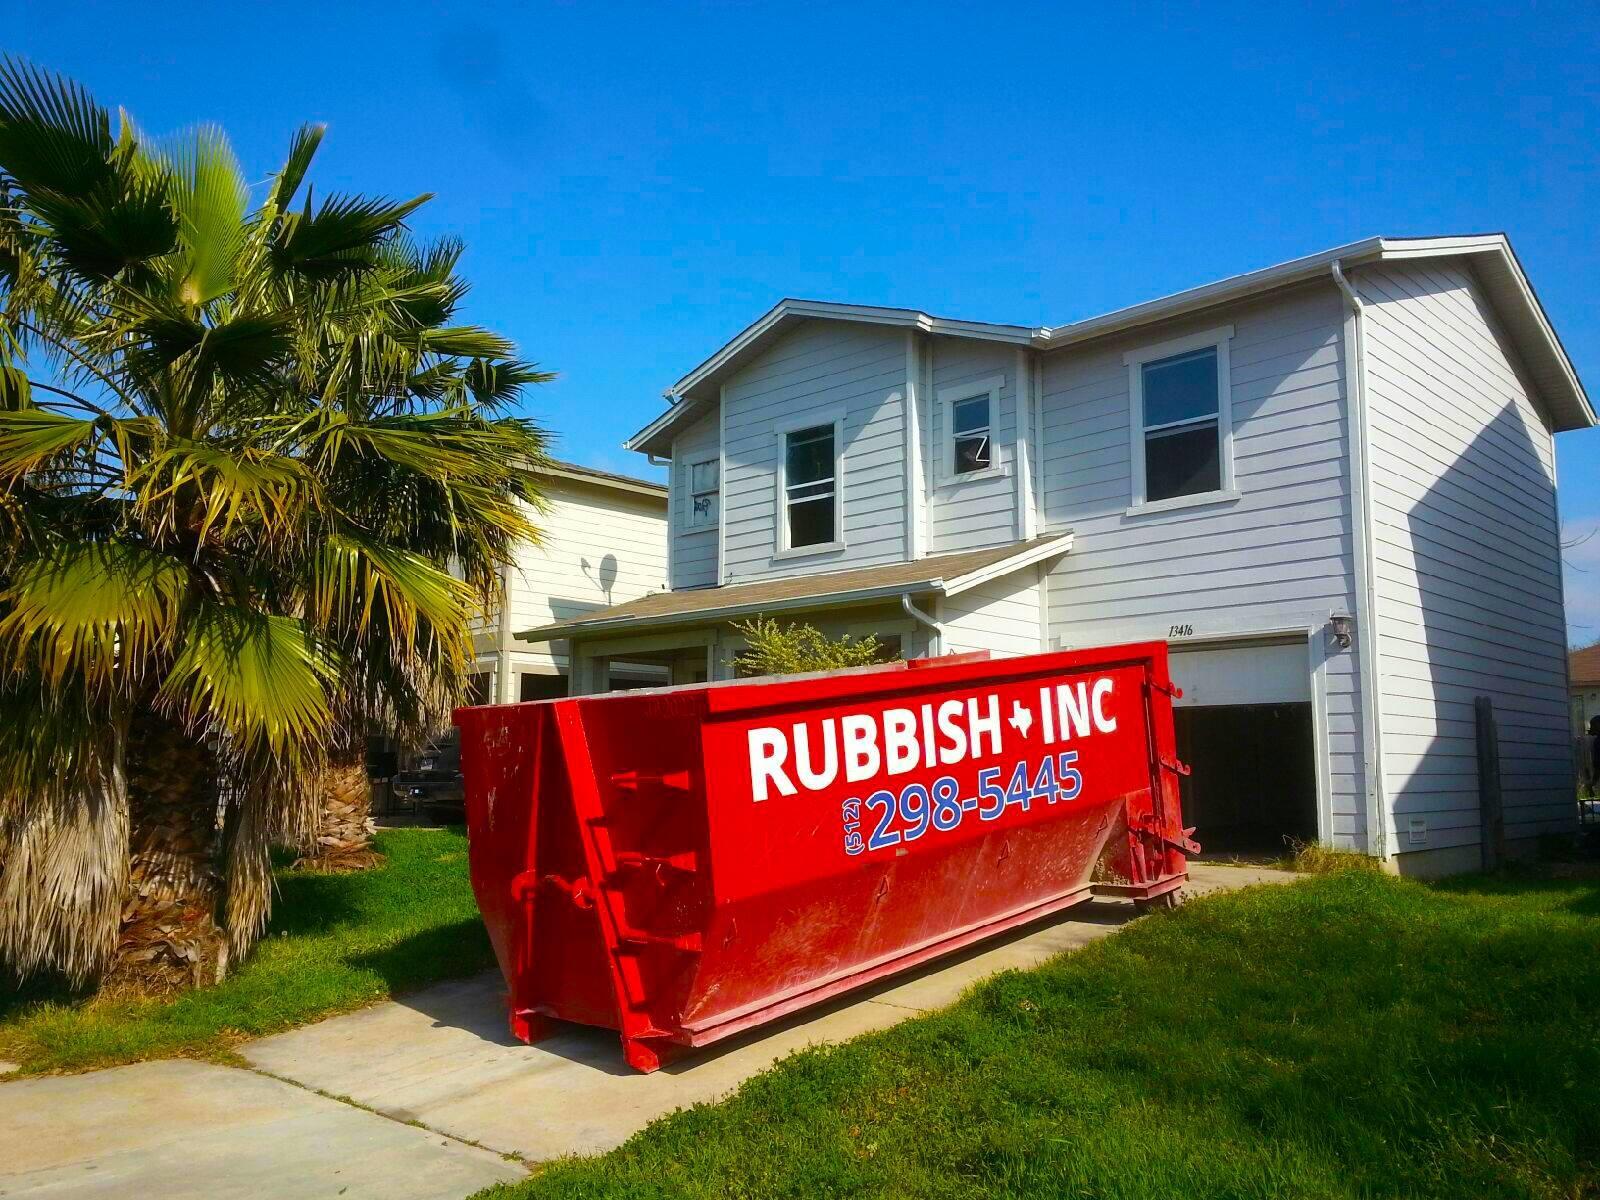 Rubbish Inc - West Austin image 0